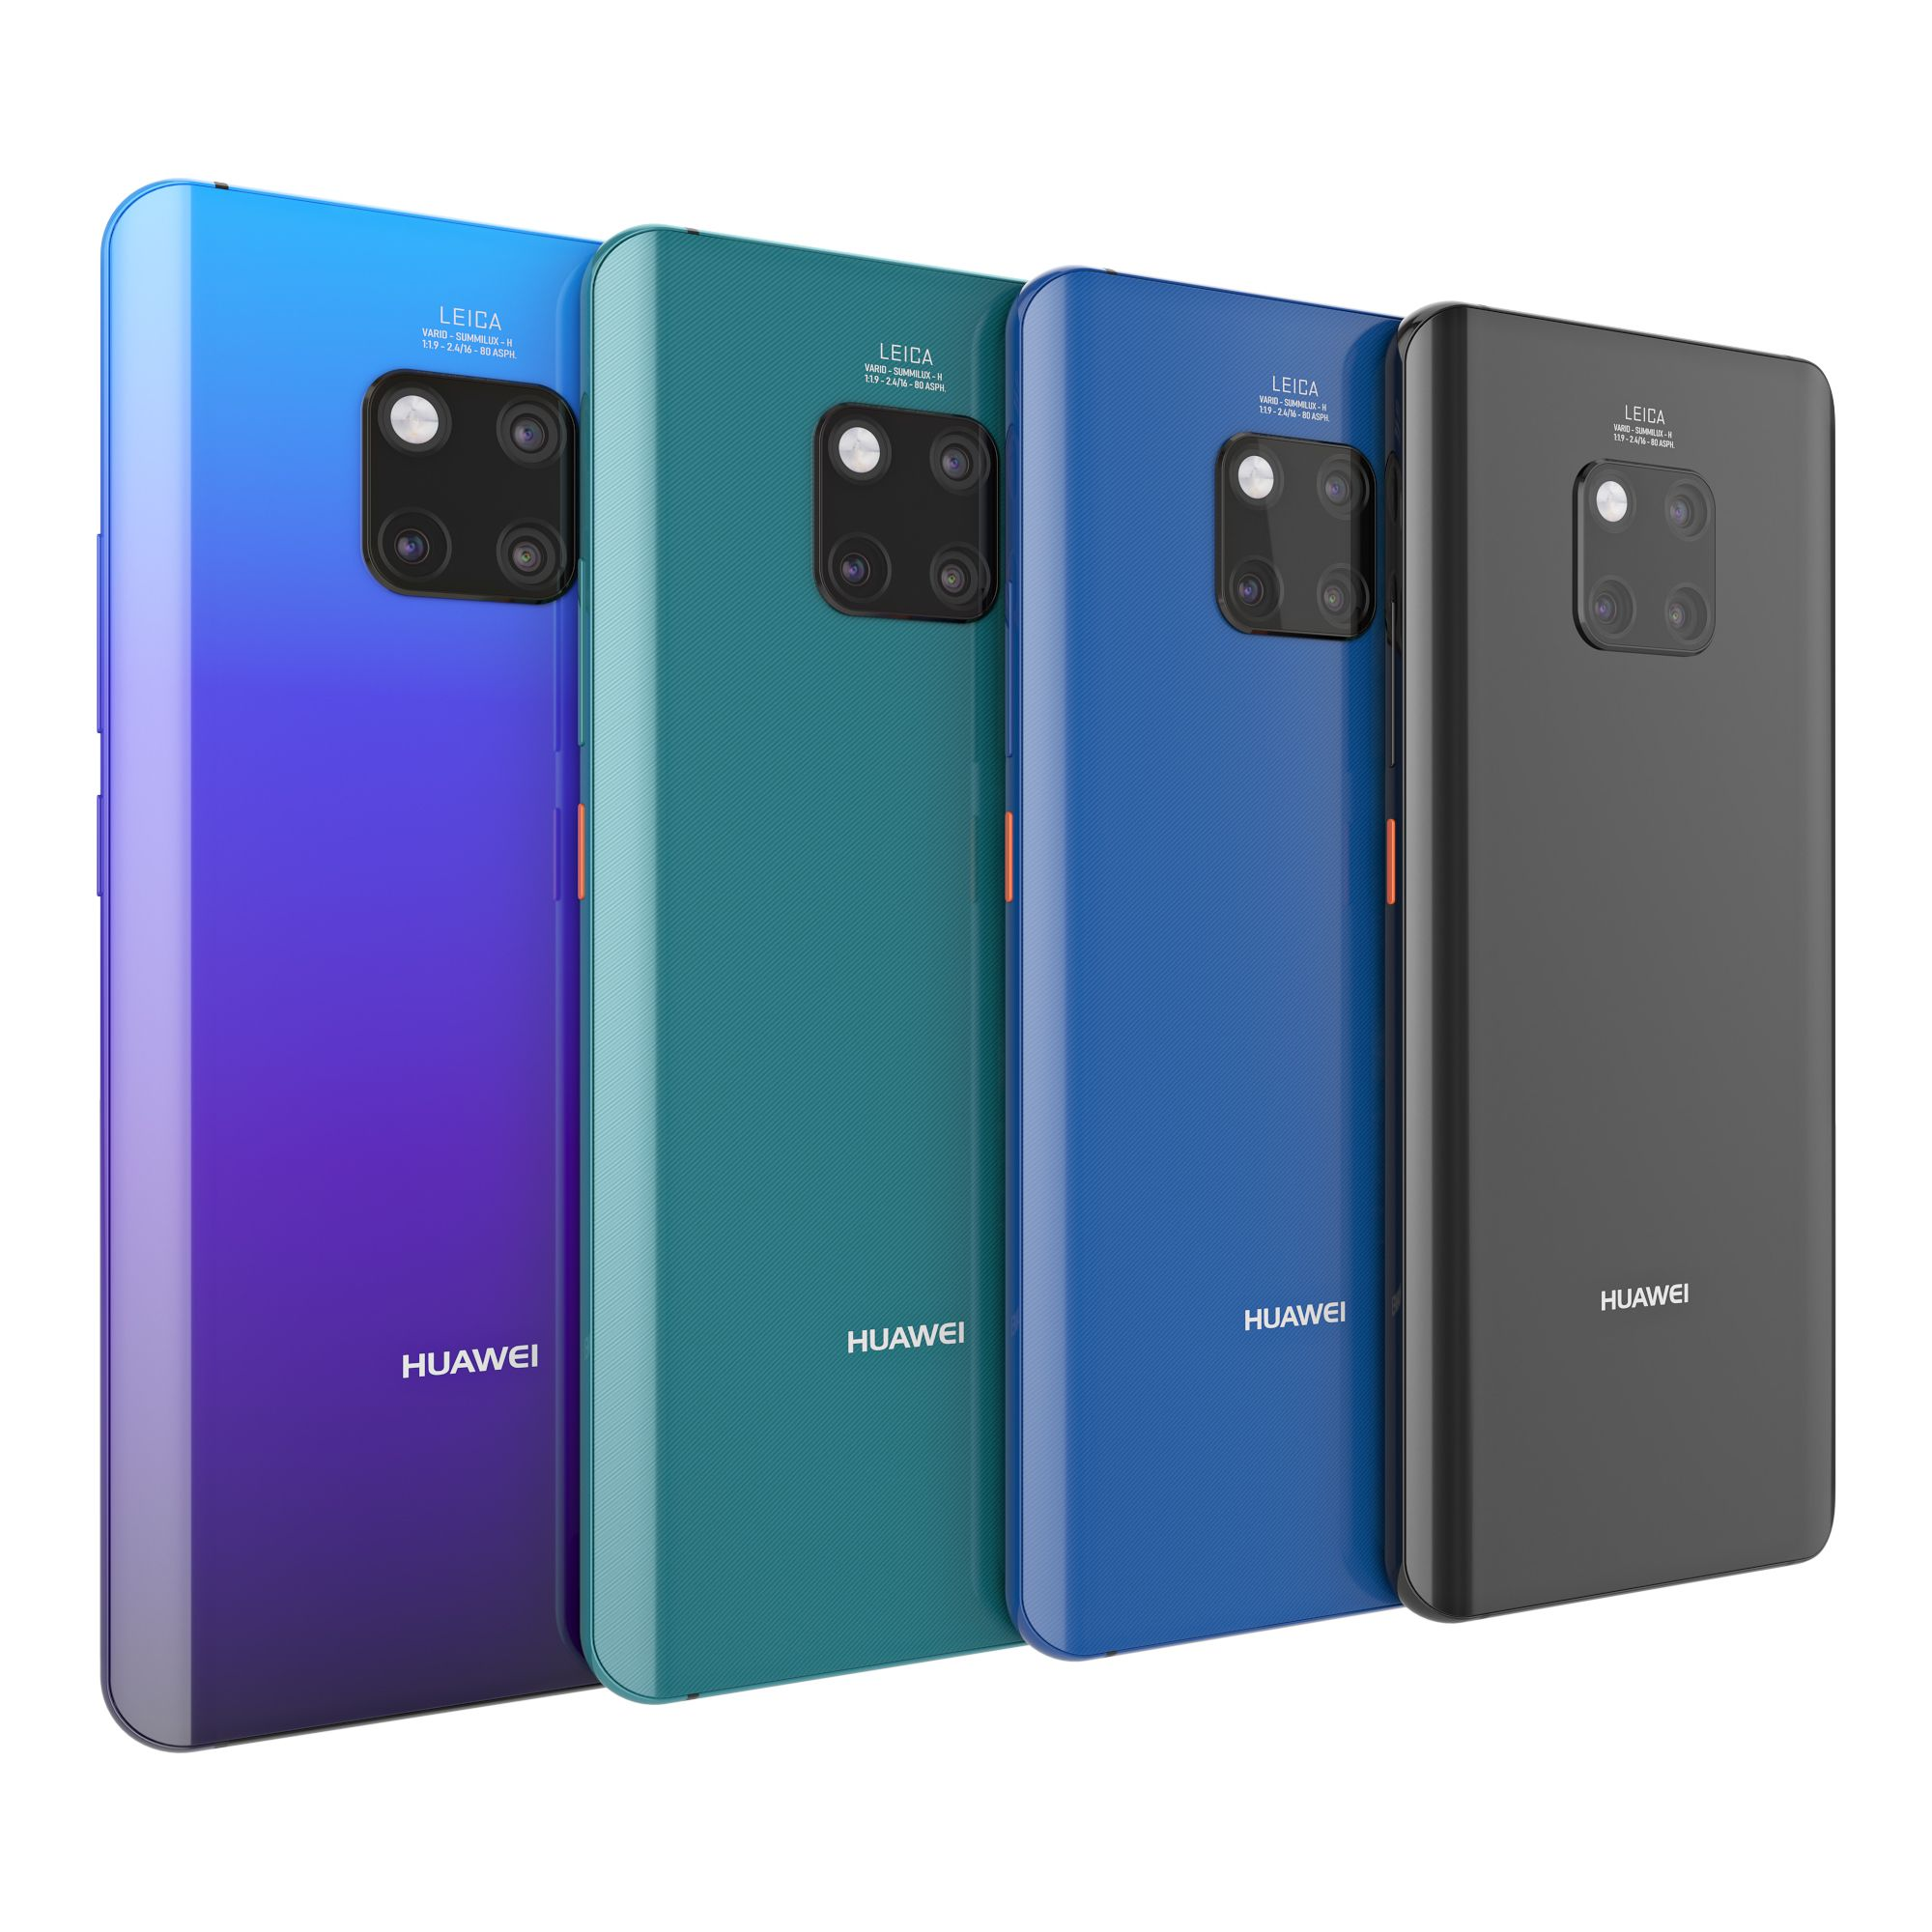 Huawei Mate 20 Pro All Color Huawei Huawei Mate Unlocked Smartphones